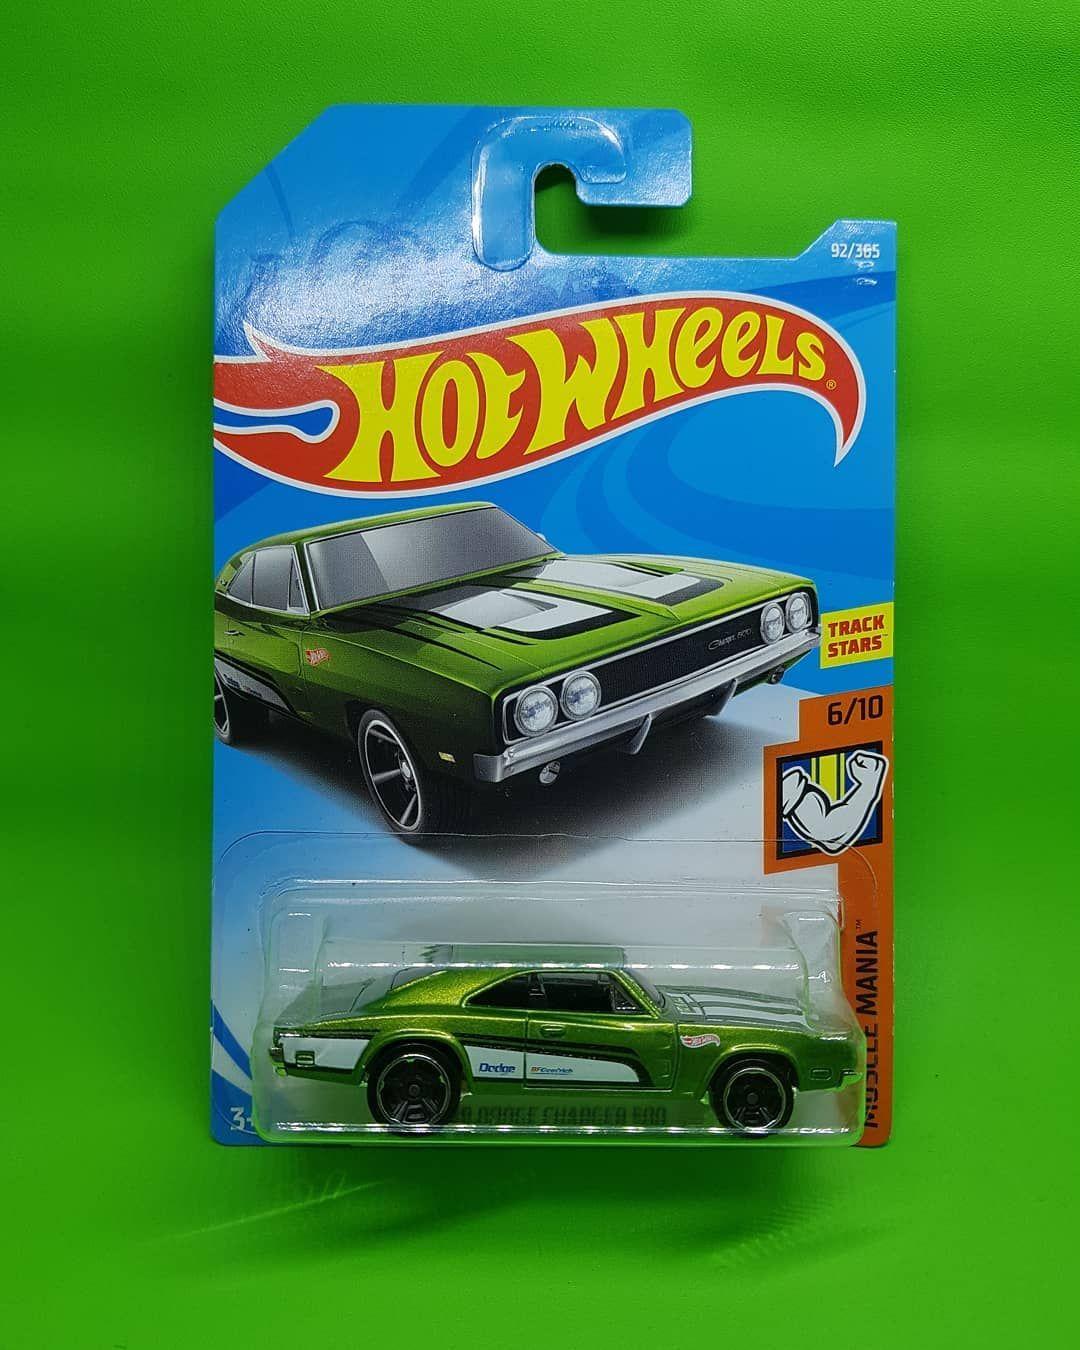 Flash sale ! HW DODGE CHARGER 500  Idr . 30k Stock : 1pcs  Card and bubble tidak sempurna 100% nggap loose aja! biar tidak kecewa!!! Note : Minat ketik